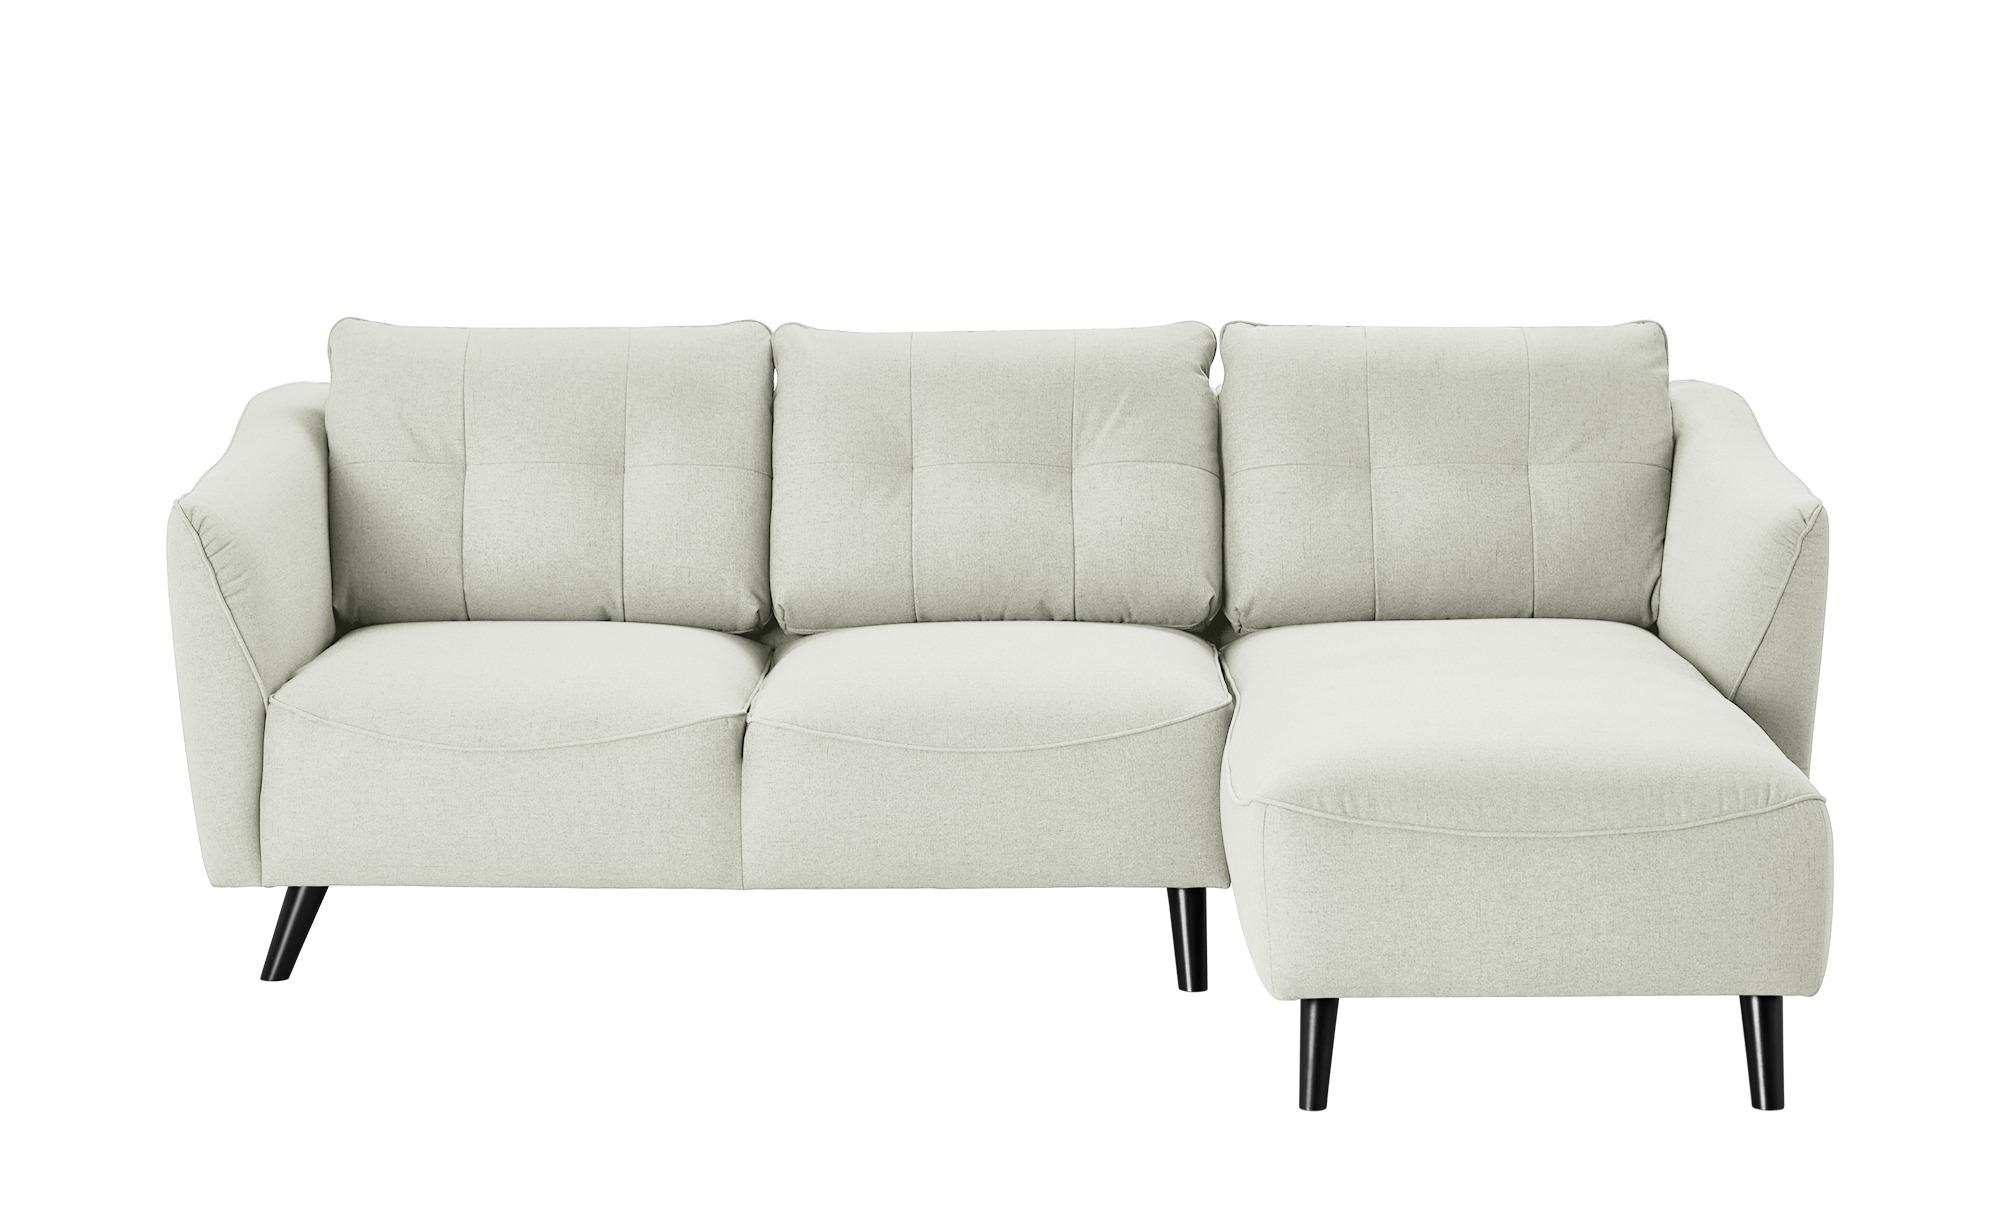 Smart Ecksofa Weiss Flachgewebe Vera Ecksofa Sofa Design Und Big Sofa Kaufen